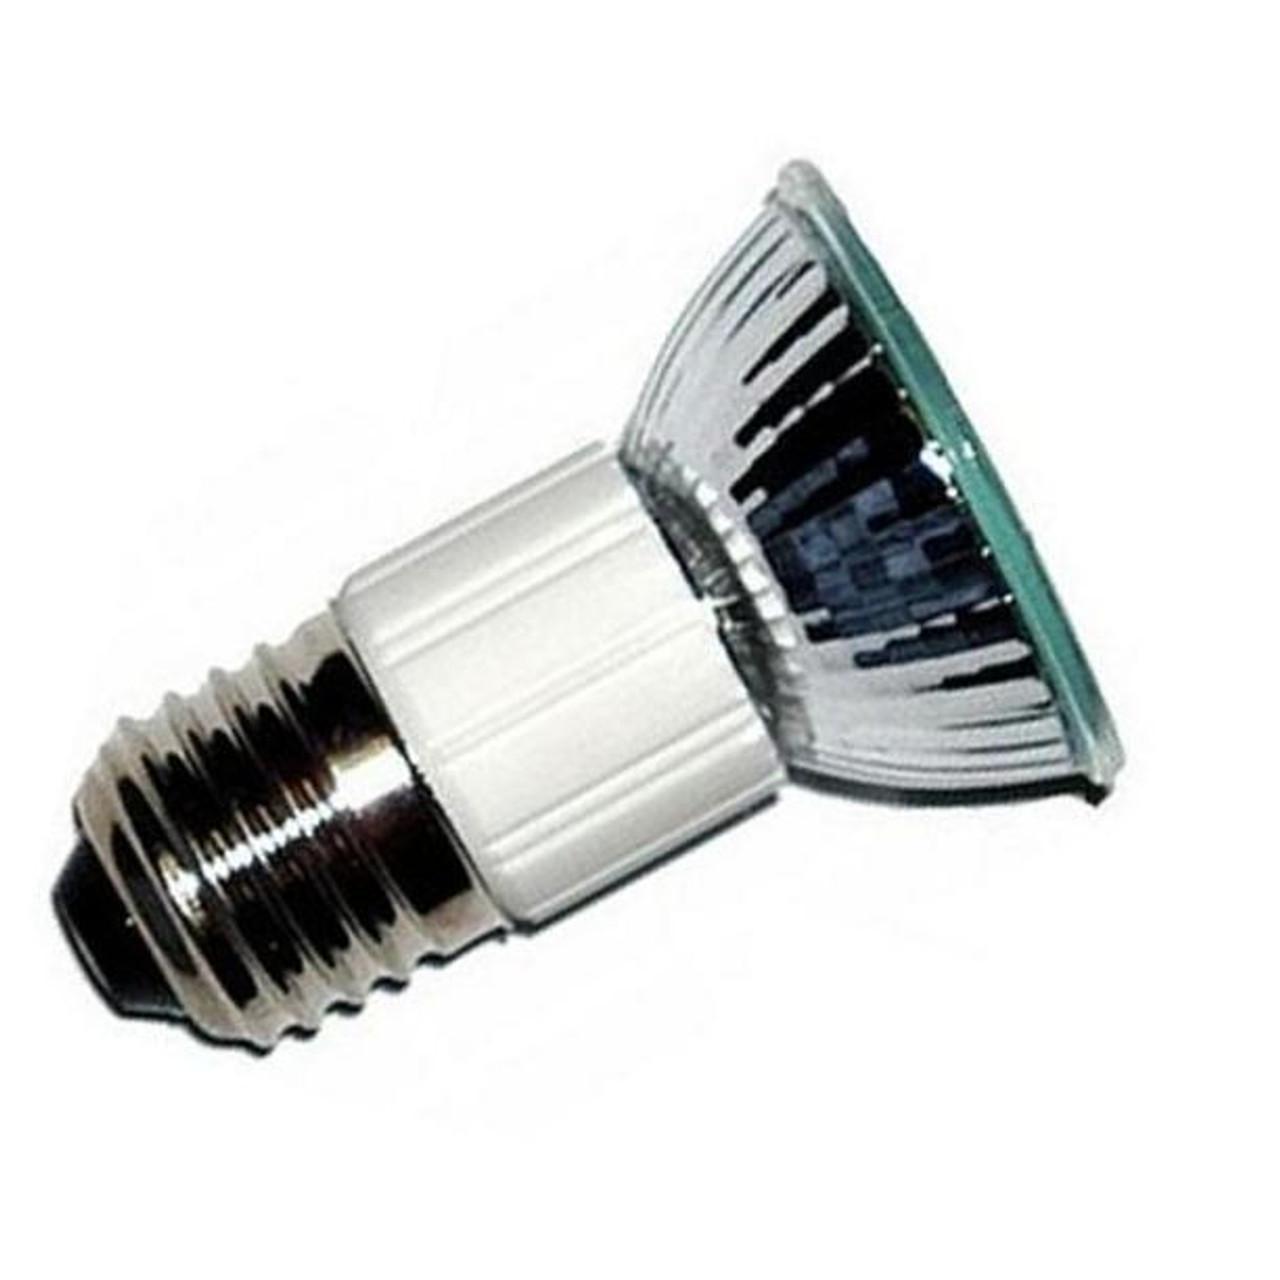 50 Watt Halogen bulb 120V 50W for Kitchen Hood GE WB08X10028  sc 1 st  Light Exports & 50 Watt Halogen bulb 120V 50W for Kitchen Hood GE WB08X10028 ...